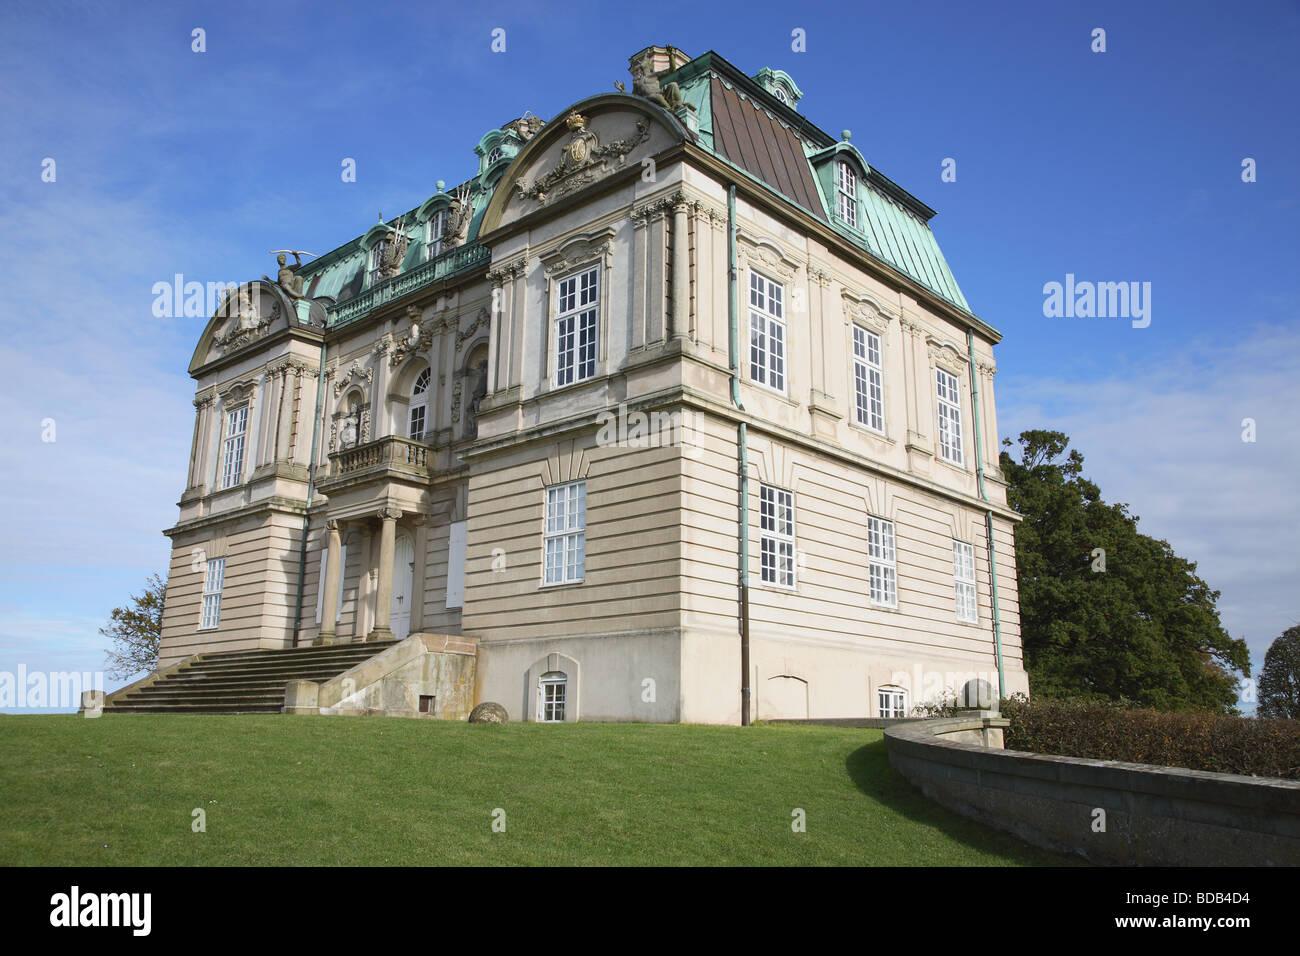 The Hermitage Palace (Eremitageslottet) in Jægersborg deer park, Dyrehaven, north of Copenhagen, Denmark. - Stock Image